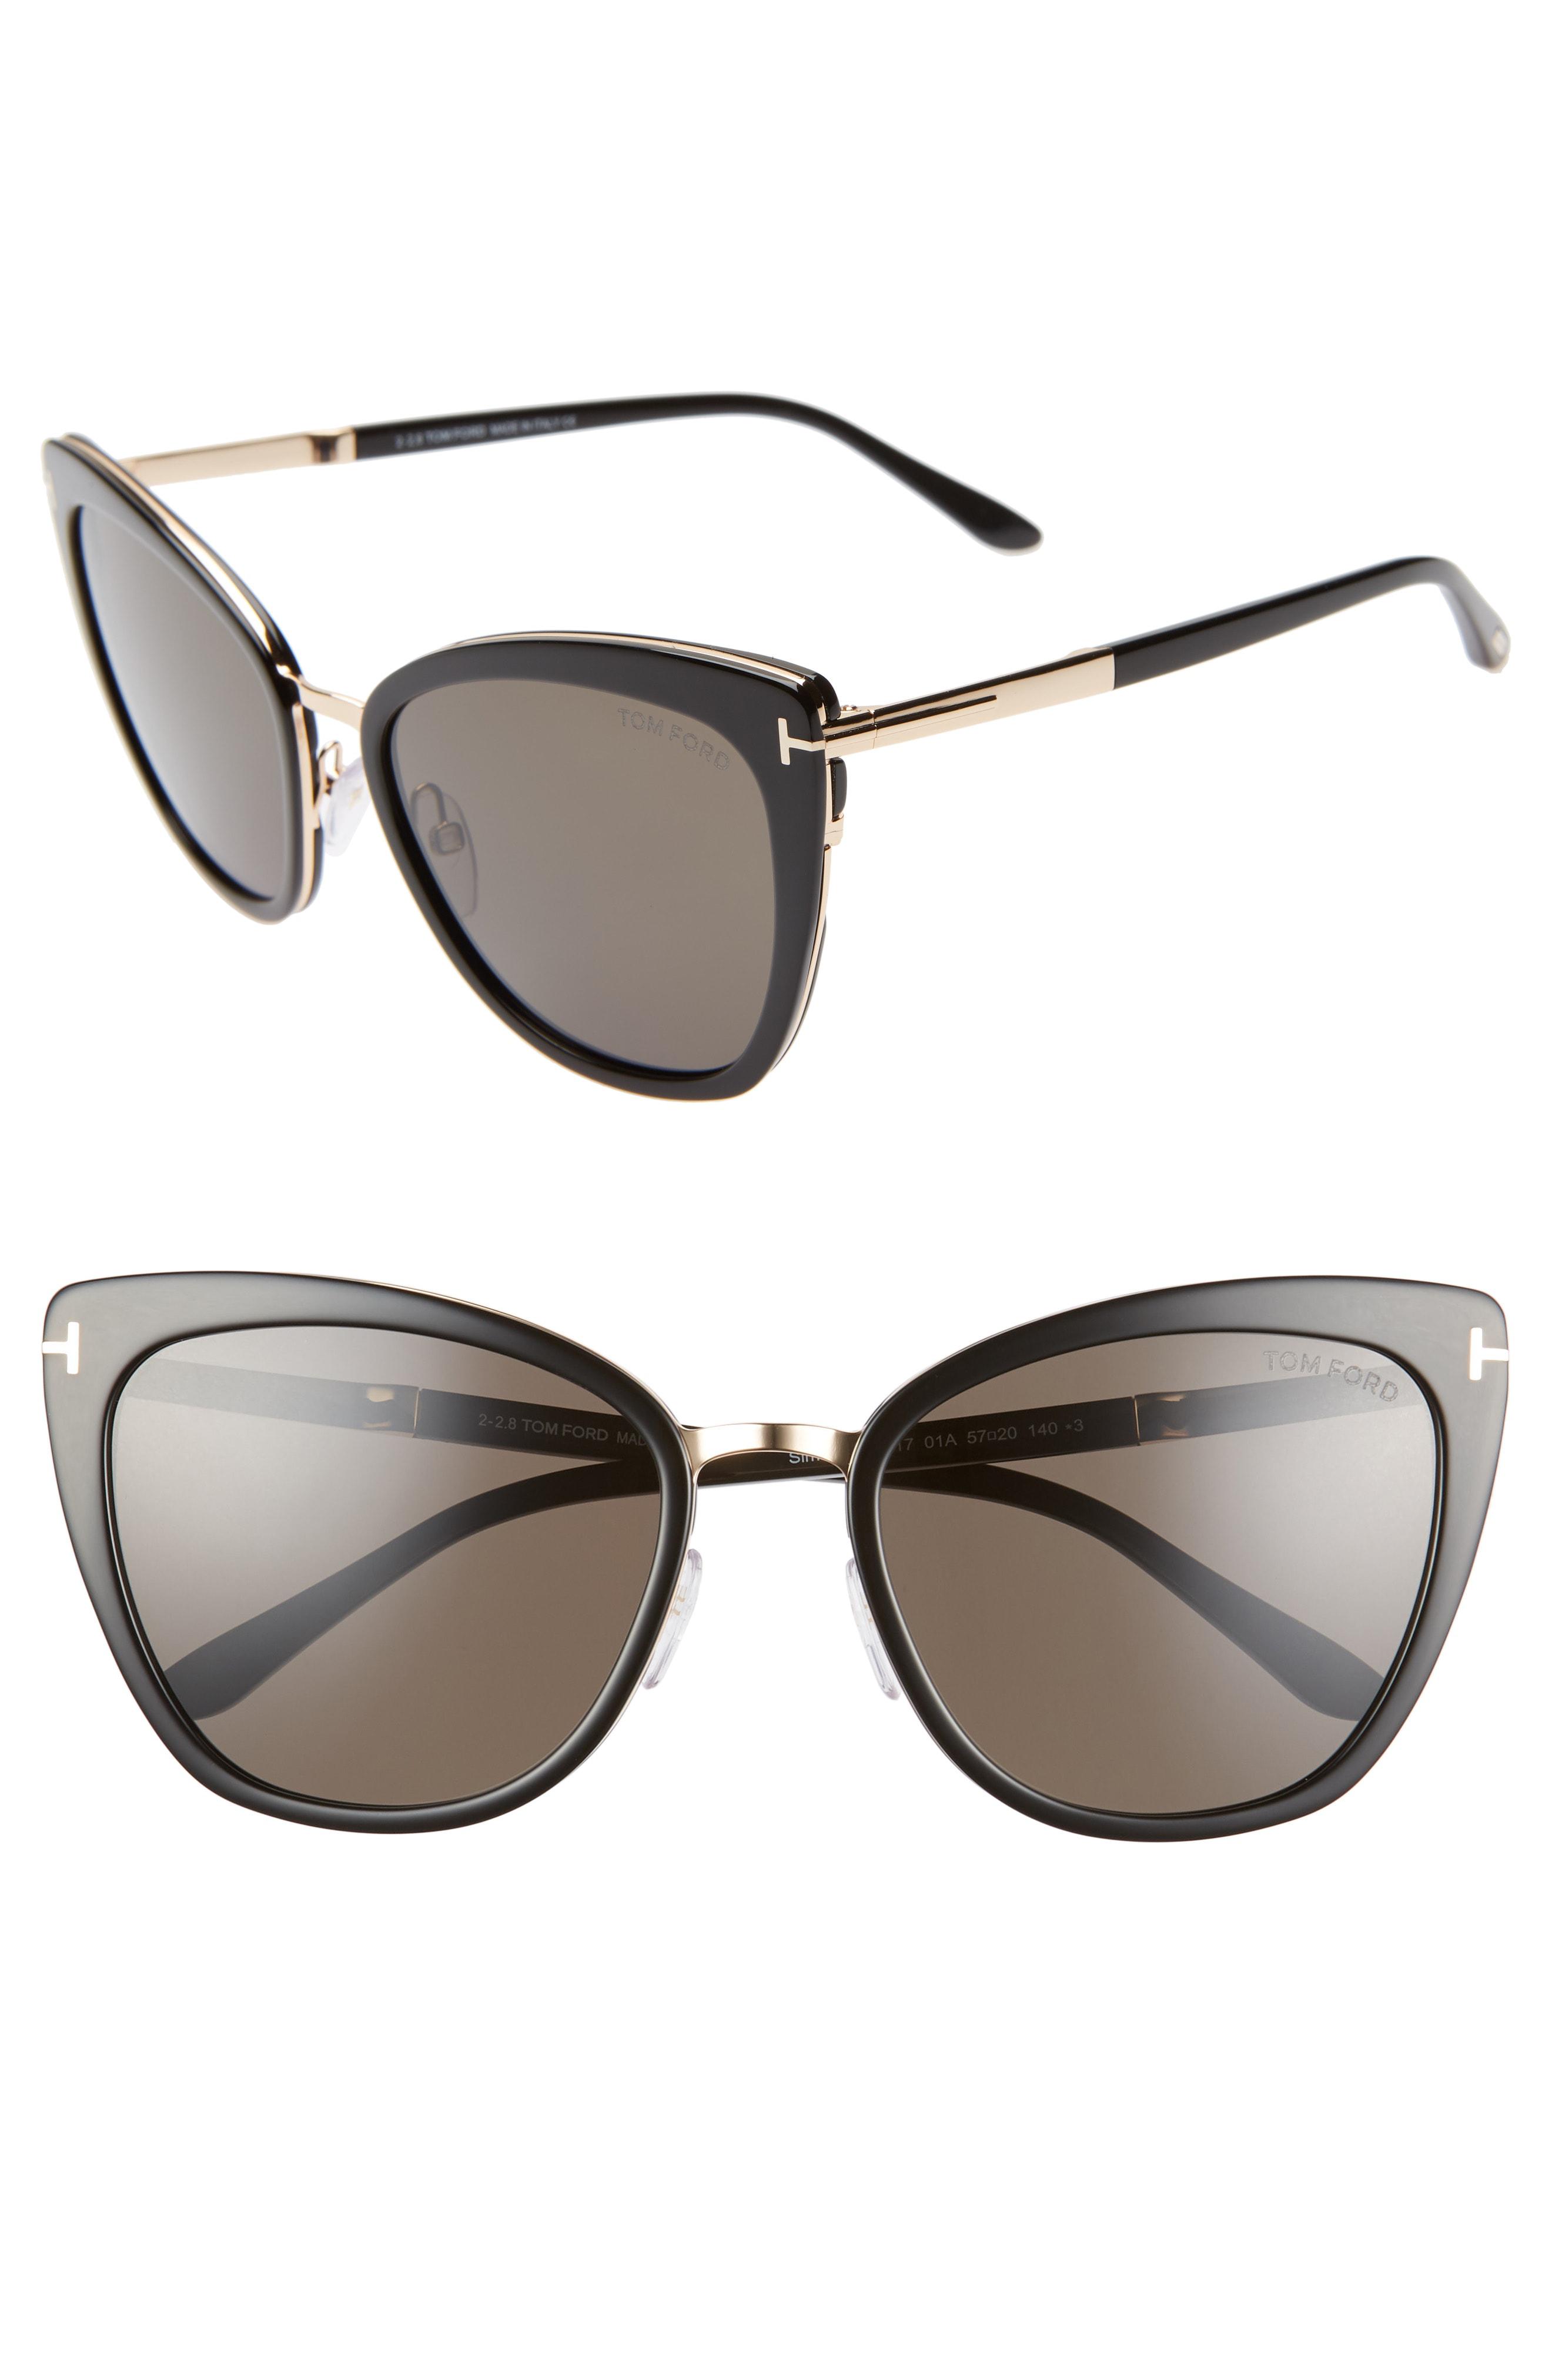 47bb4765a3f2 Tom Ford Simona 56Mm Sunglasses - Black  Rose Gold  Smoke